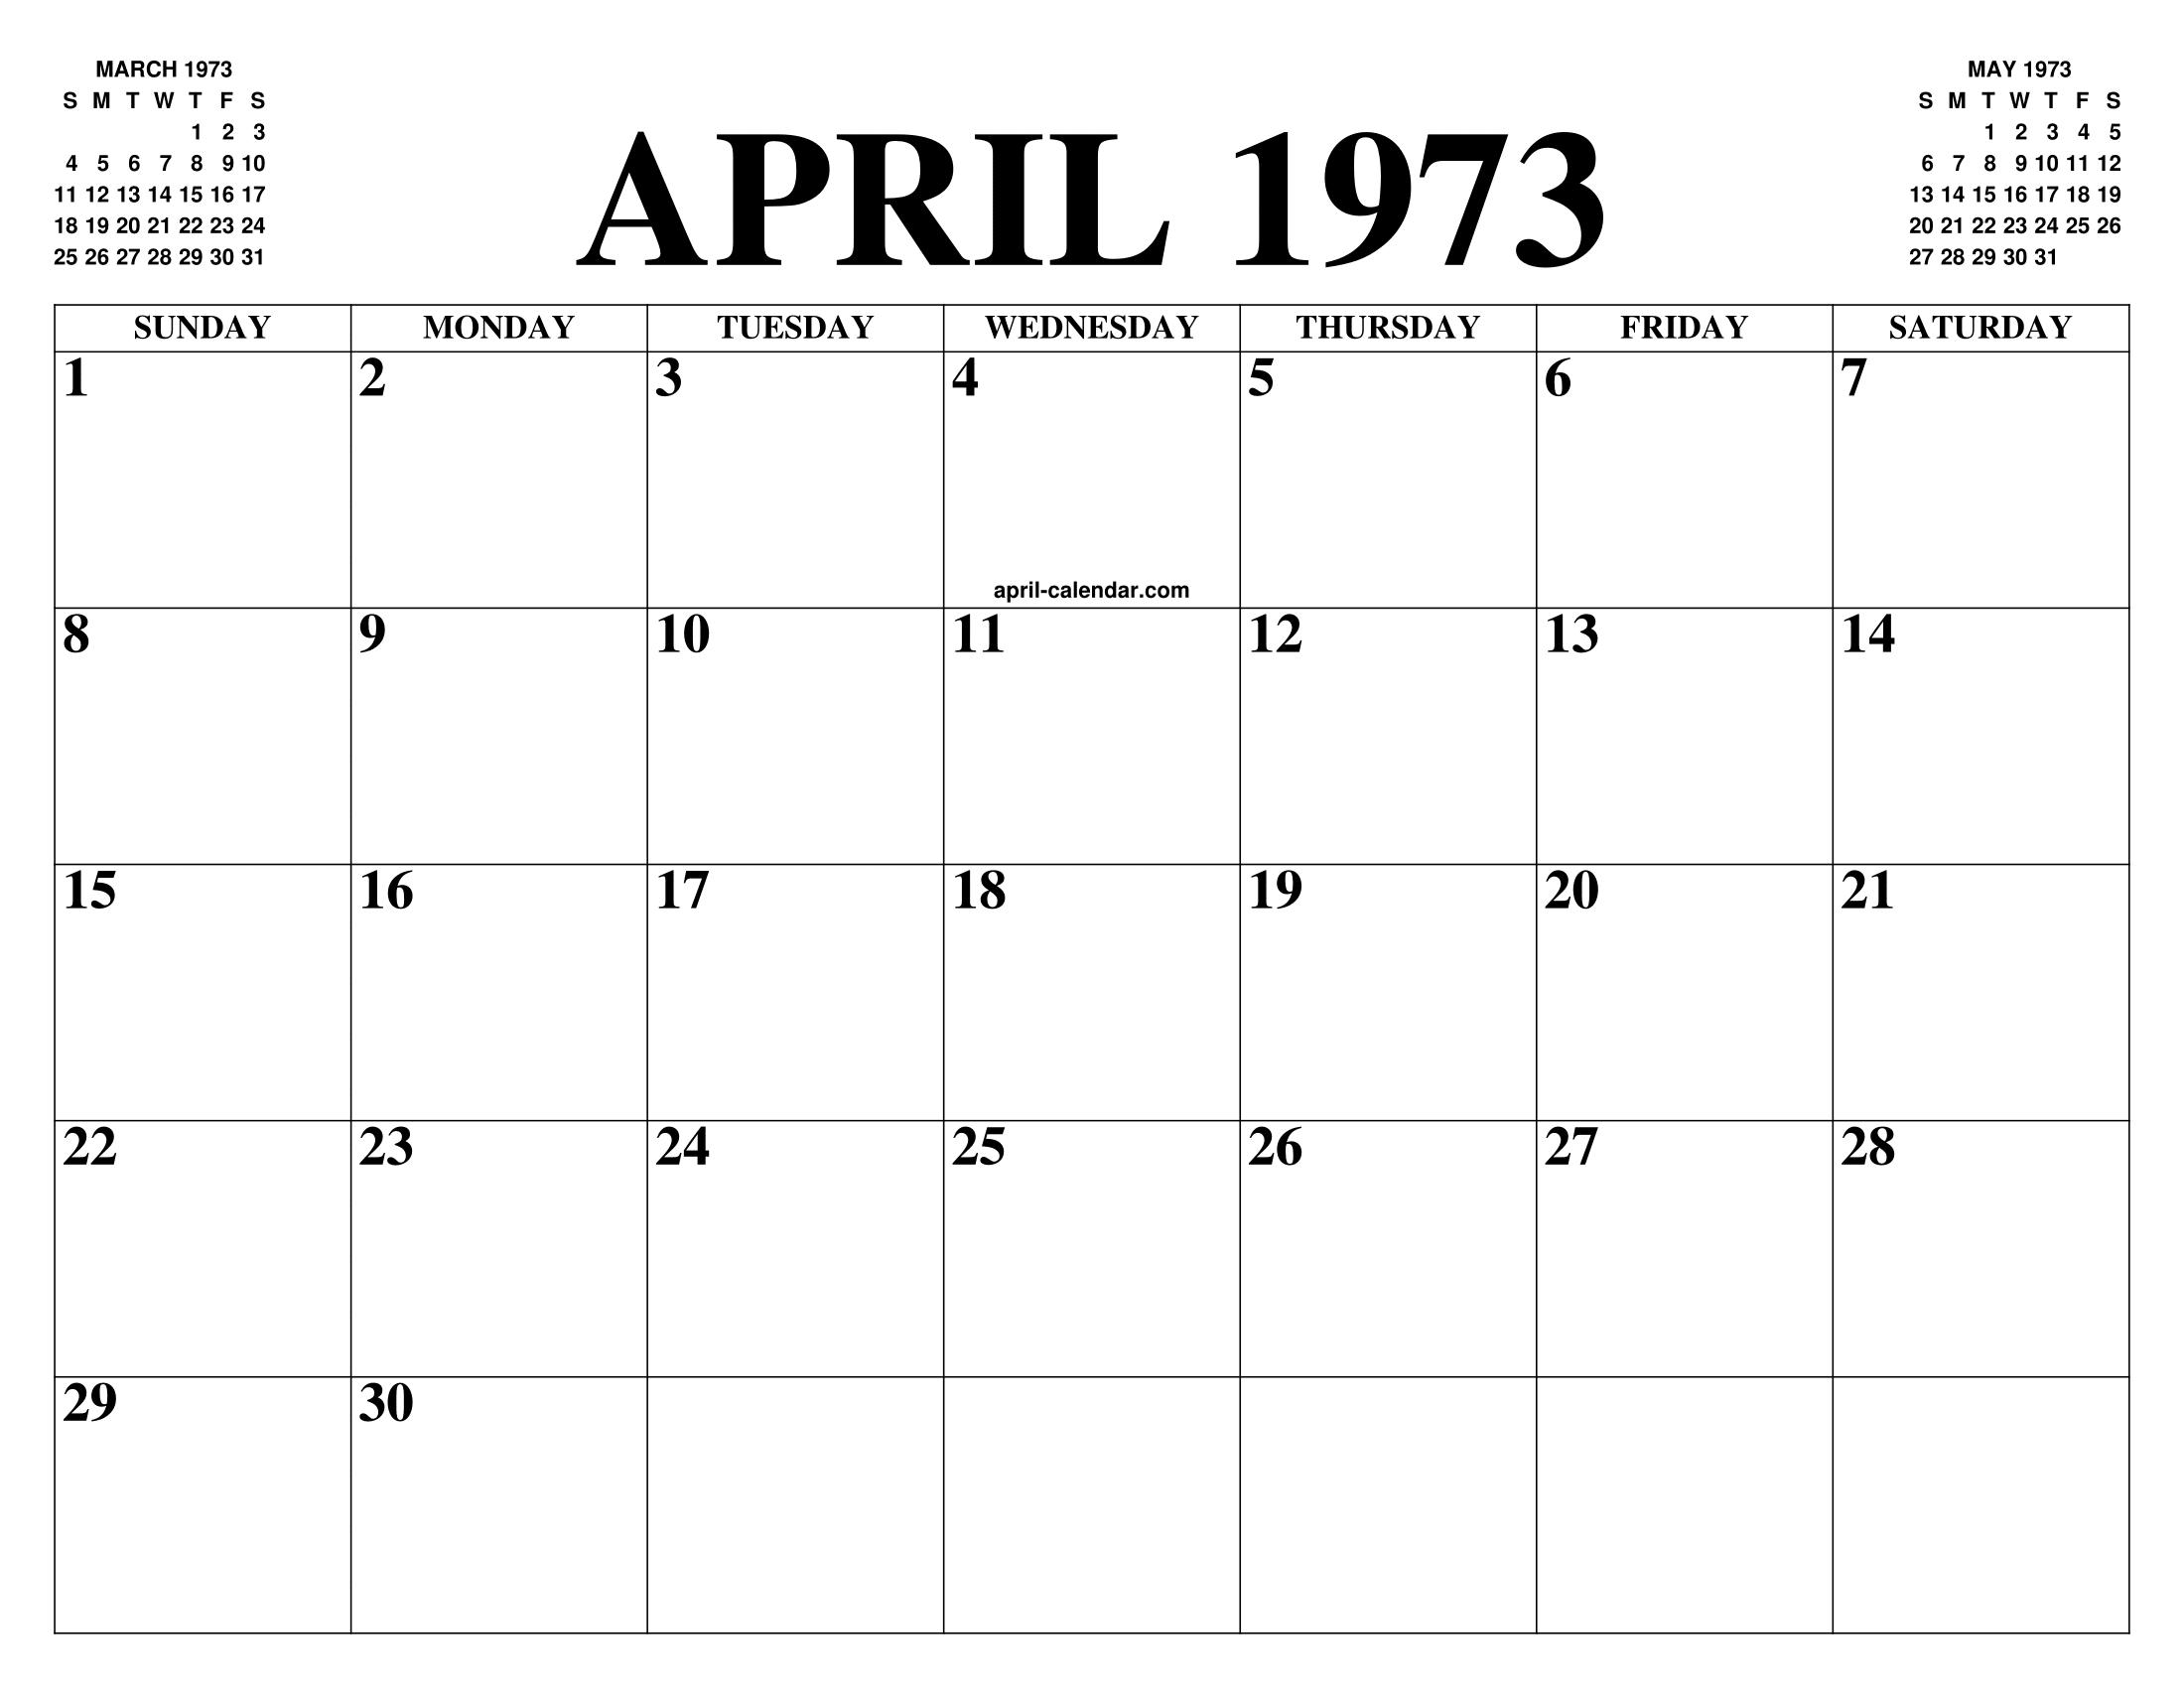 Calendario 1973.April 1973 Calendar Of The Month Free Printable April